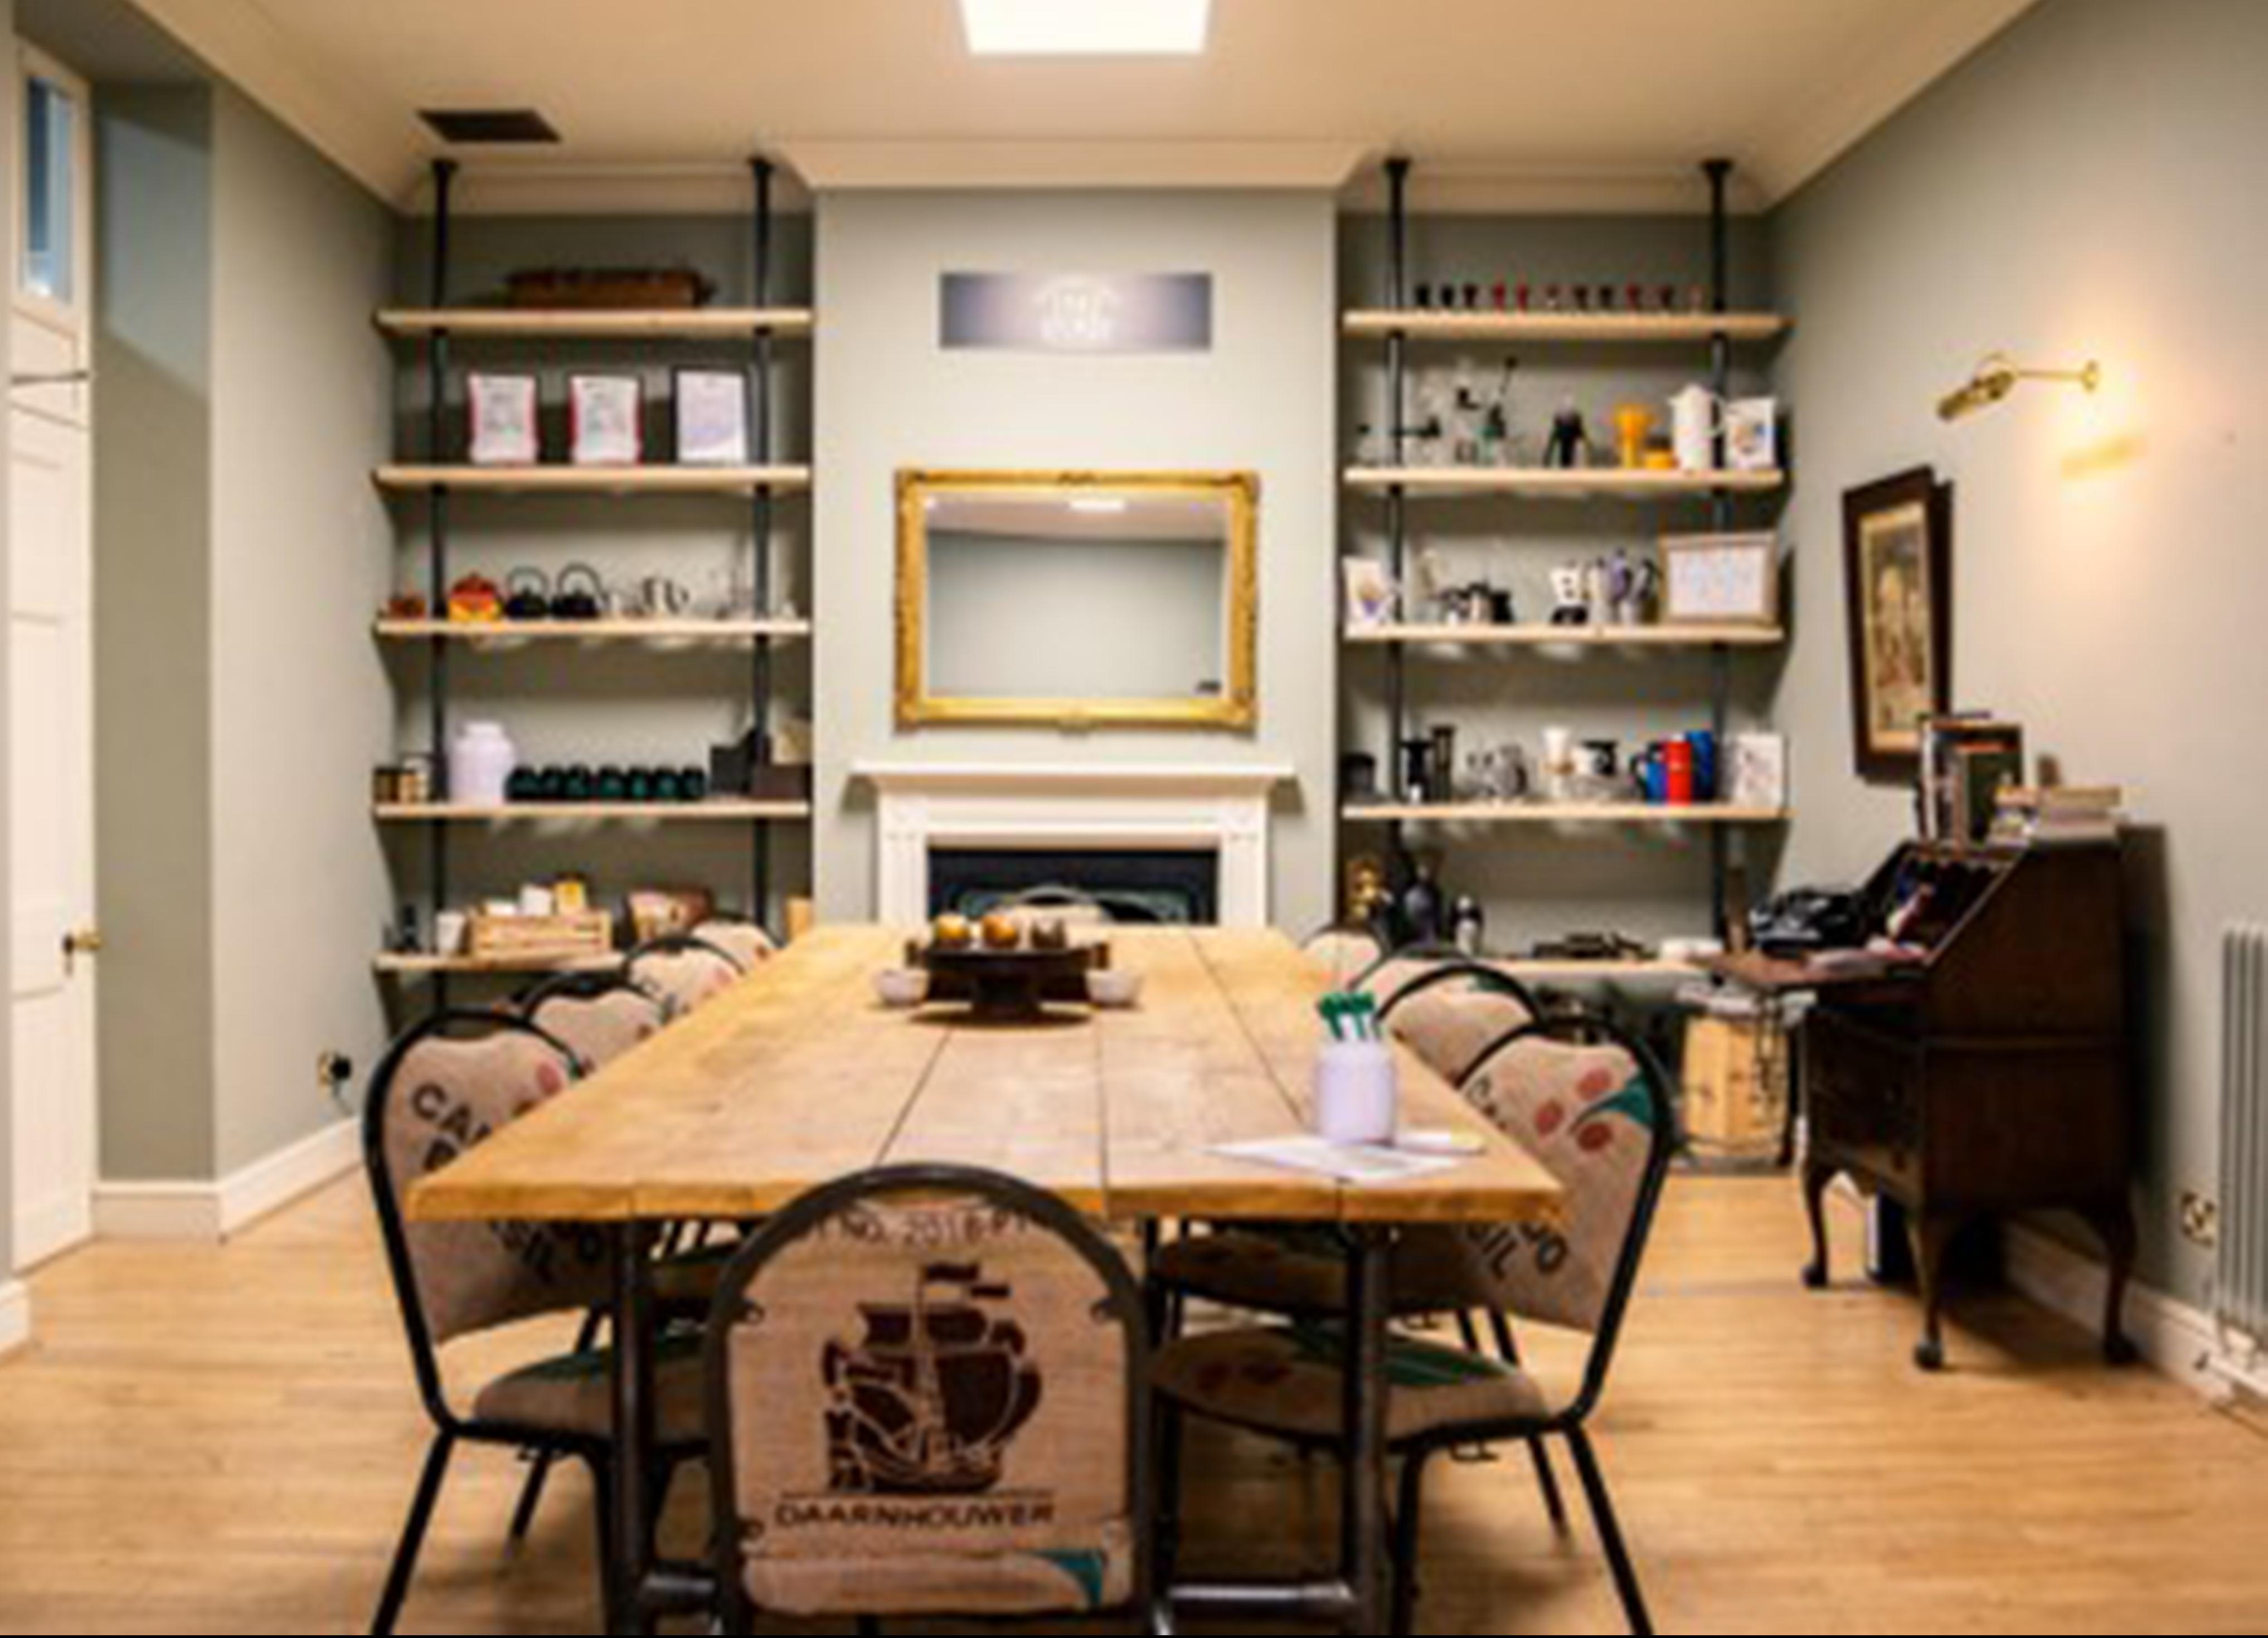 Barista Training Room